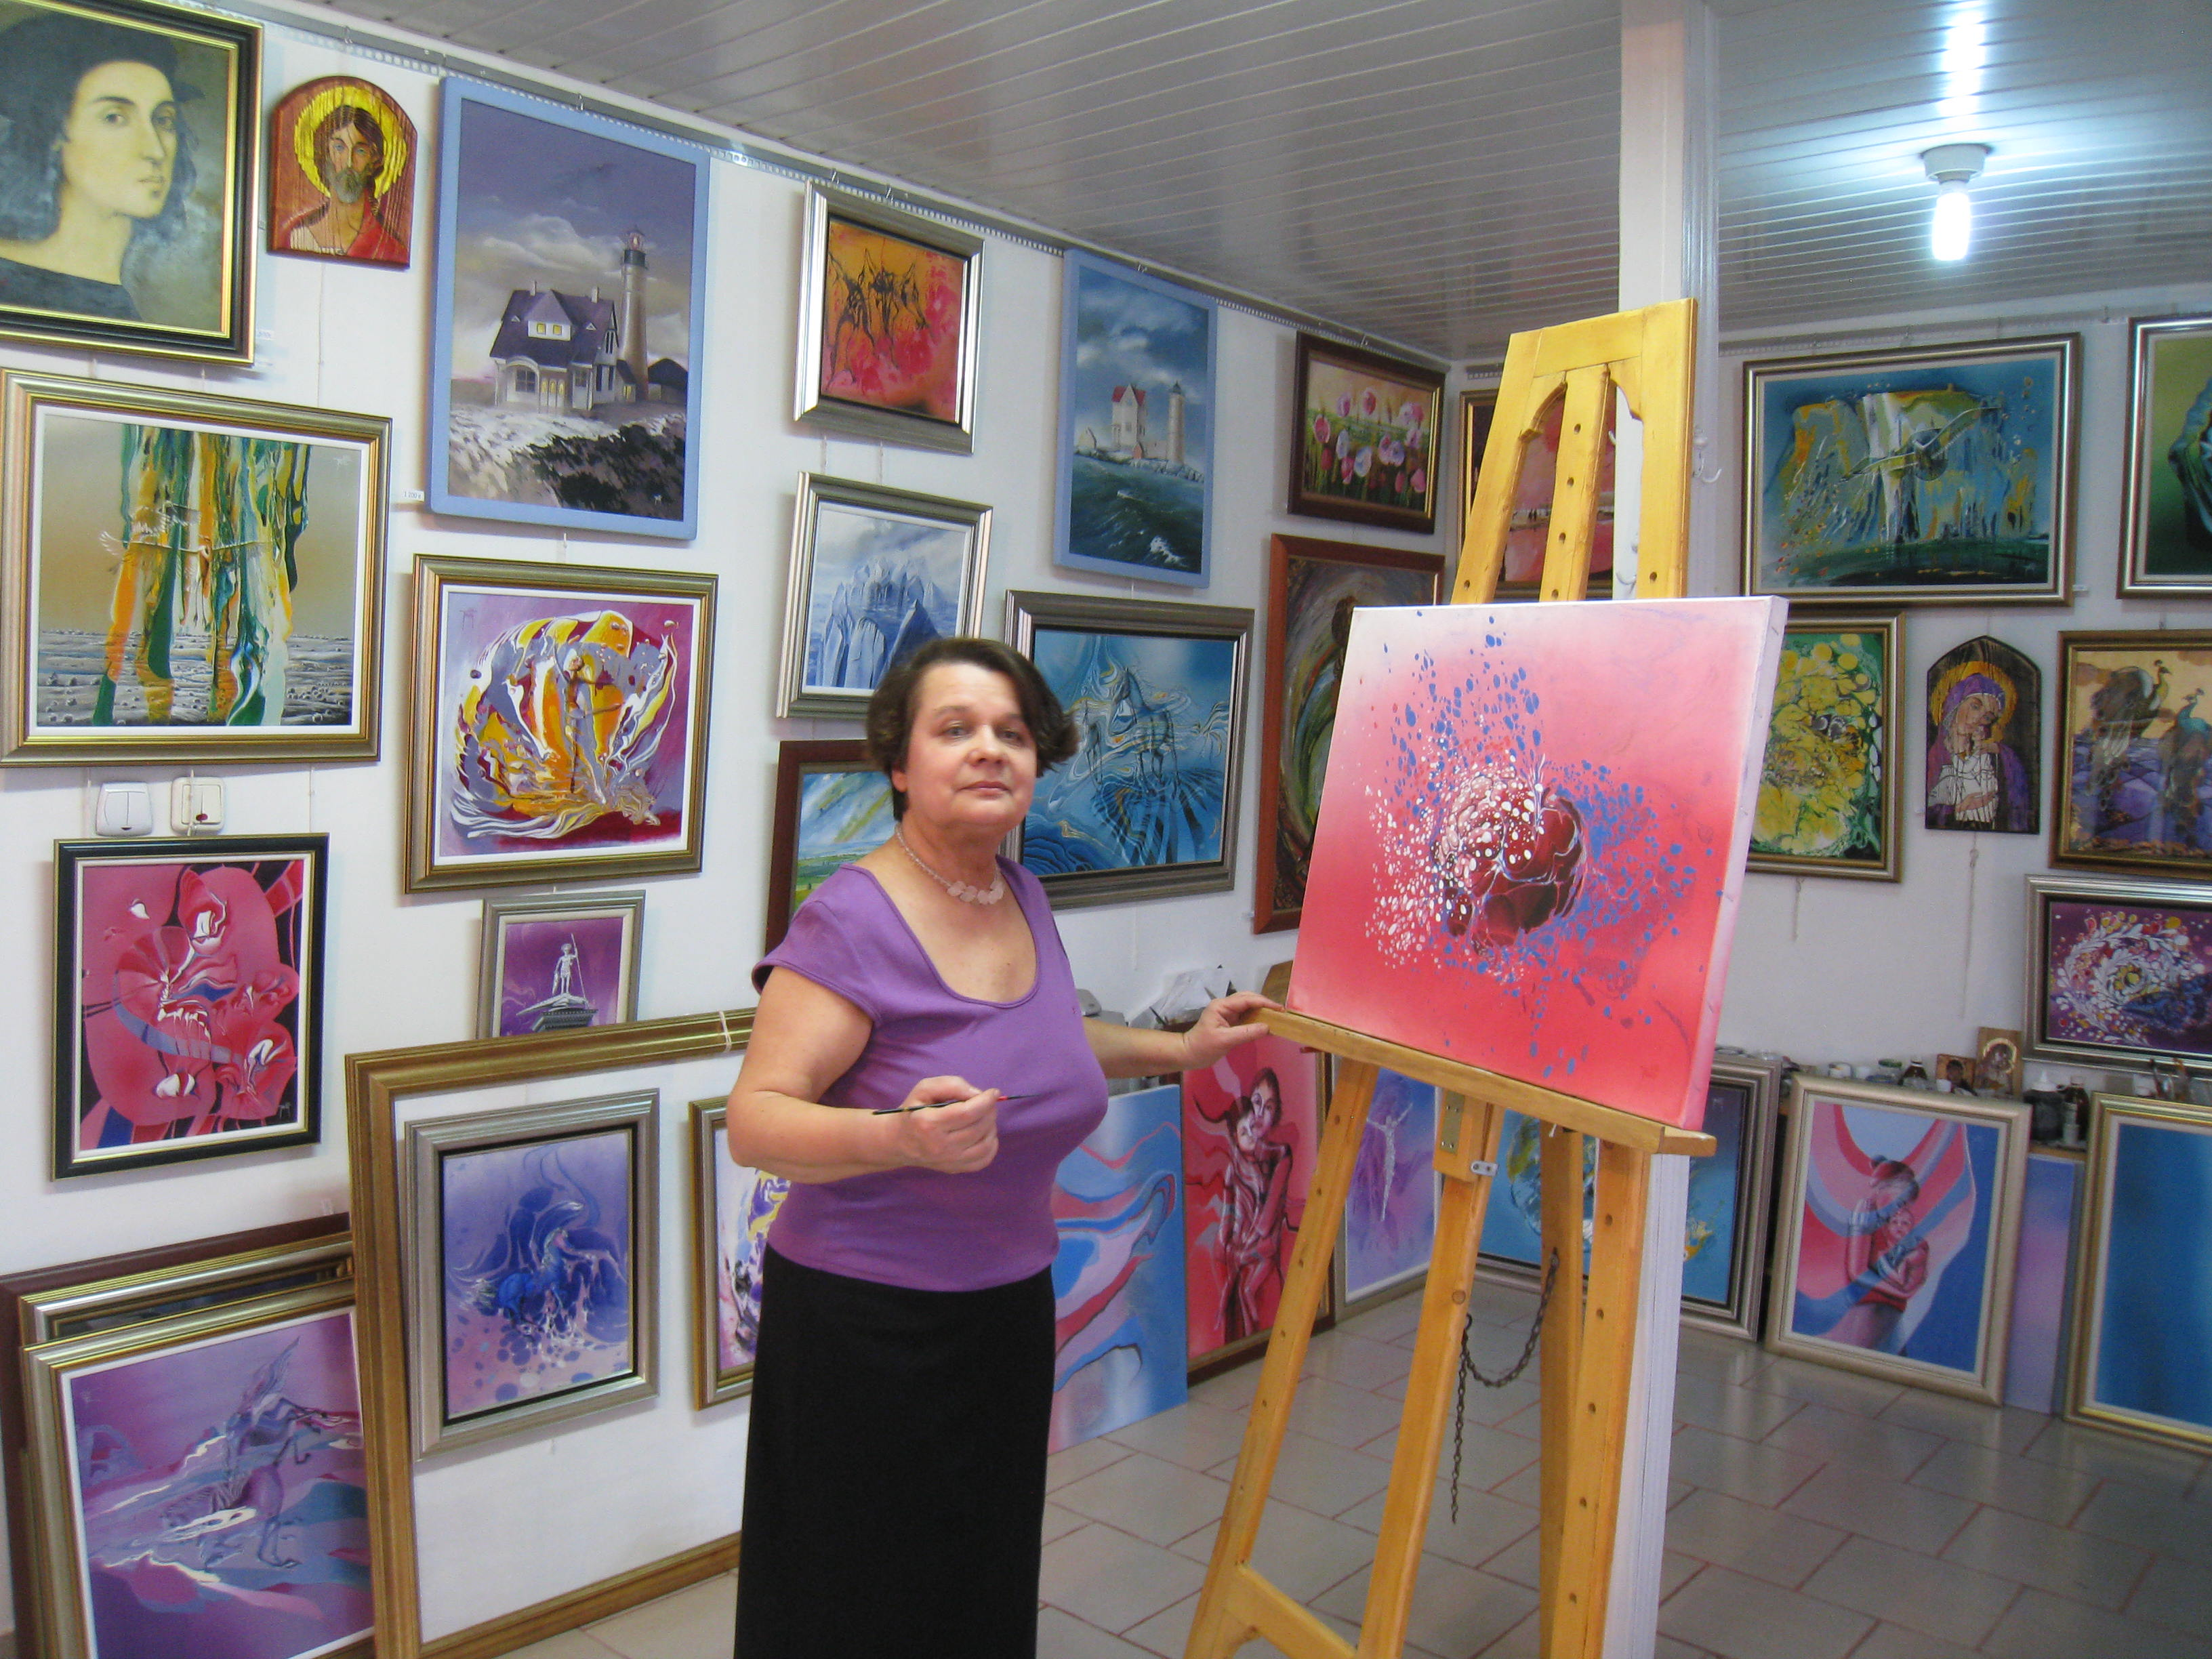 Artista in atelier